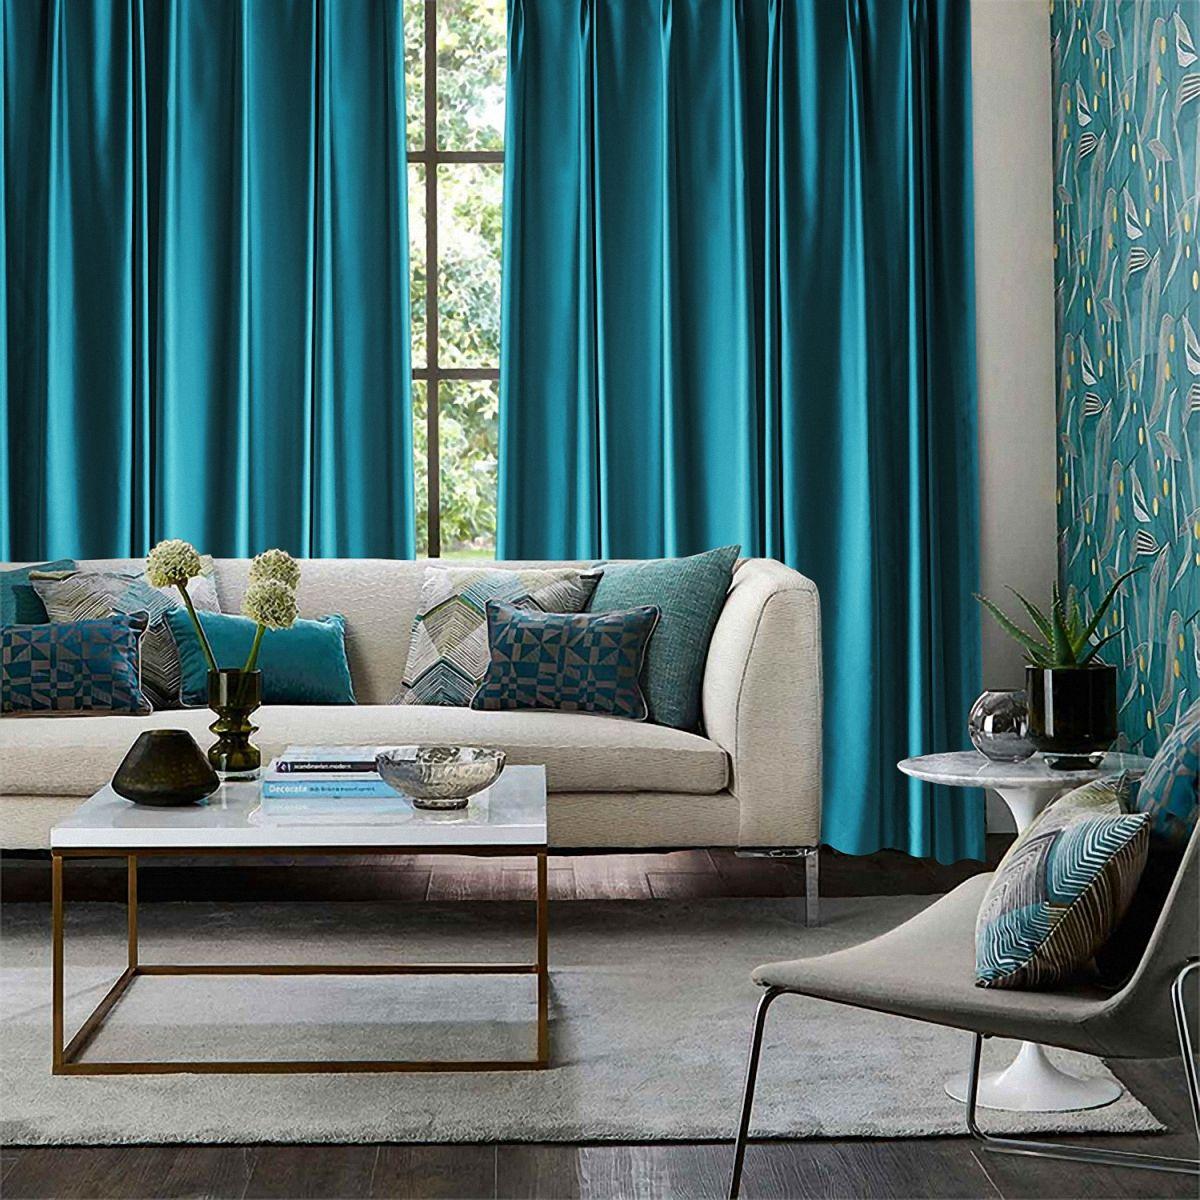 Pair Of Luxury Window Curtains Bedroom Curtains Living Room